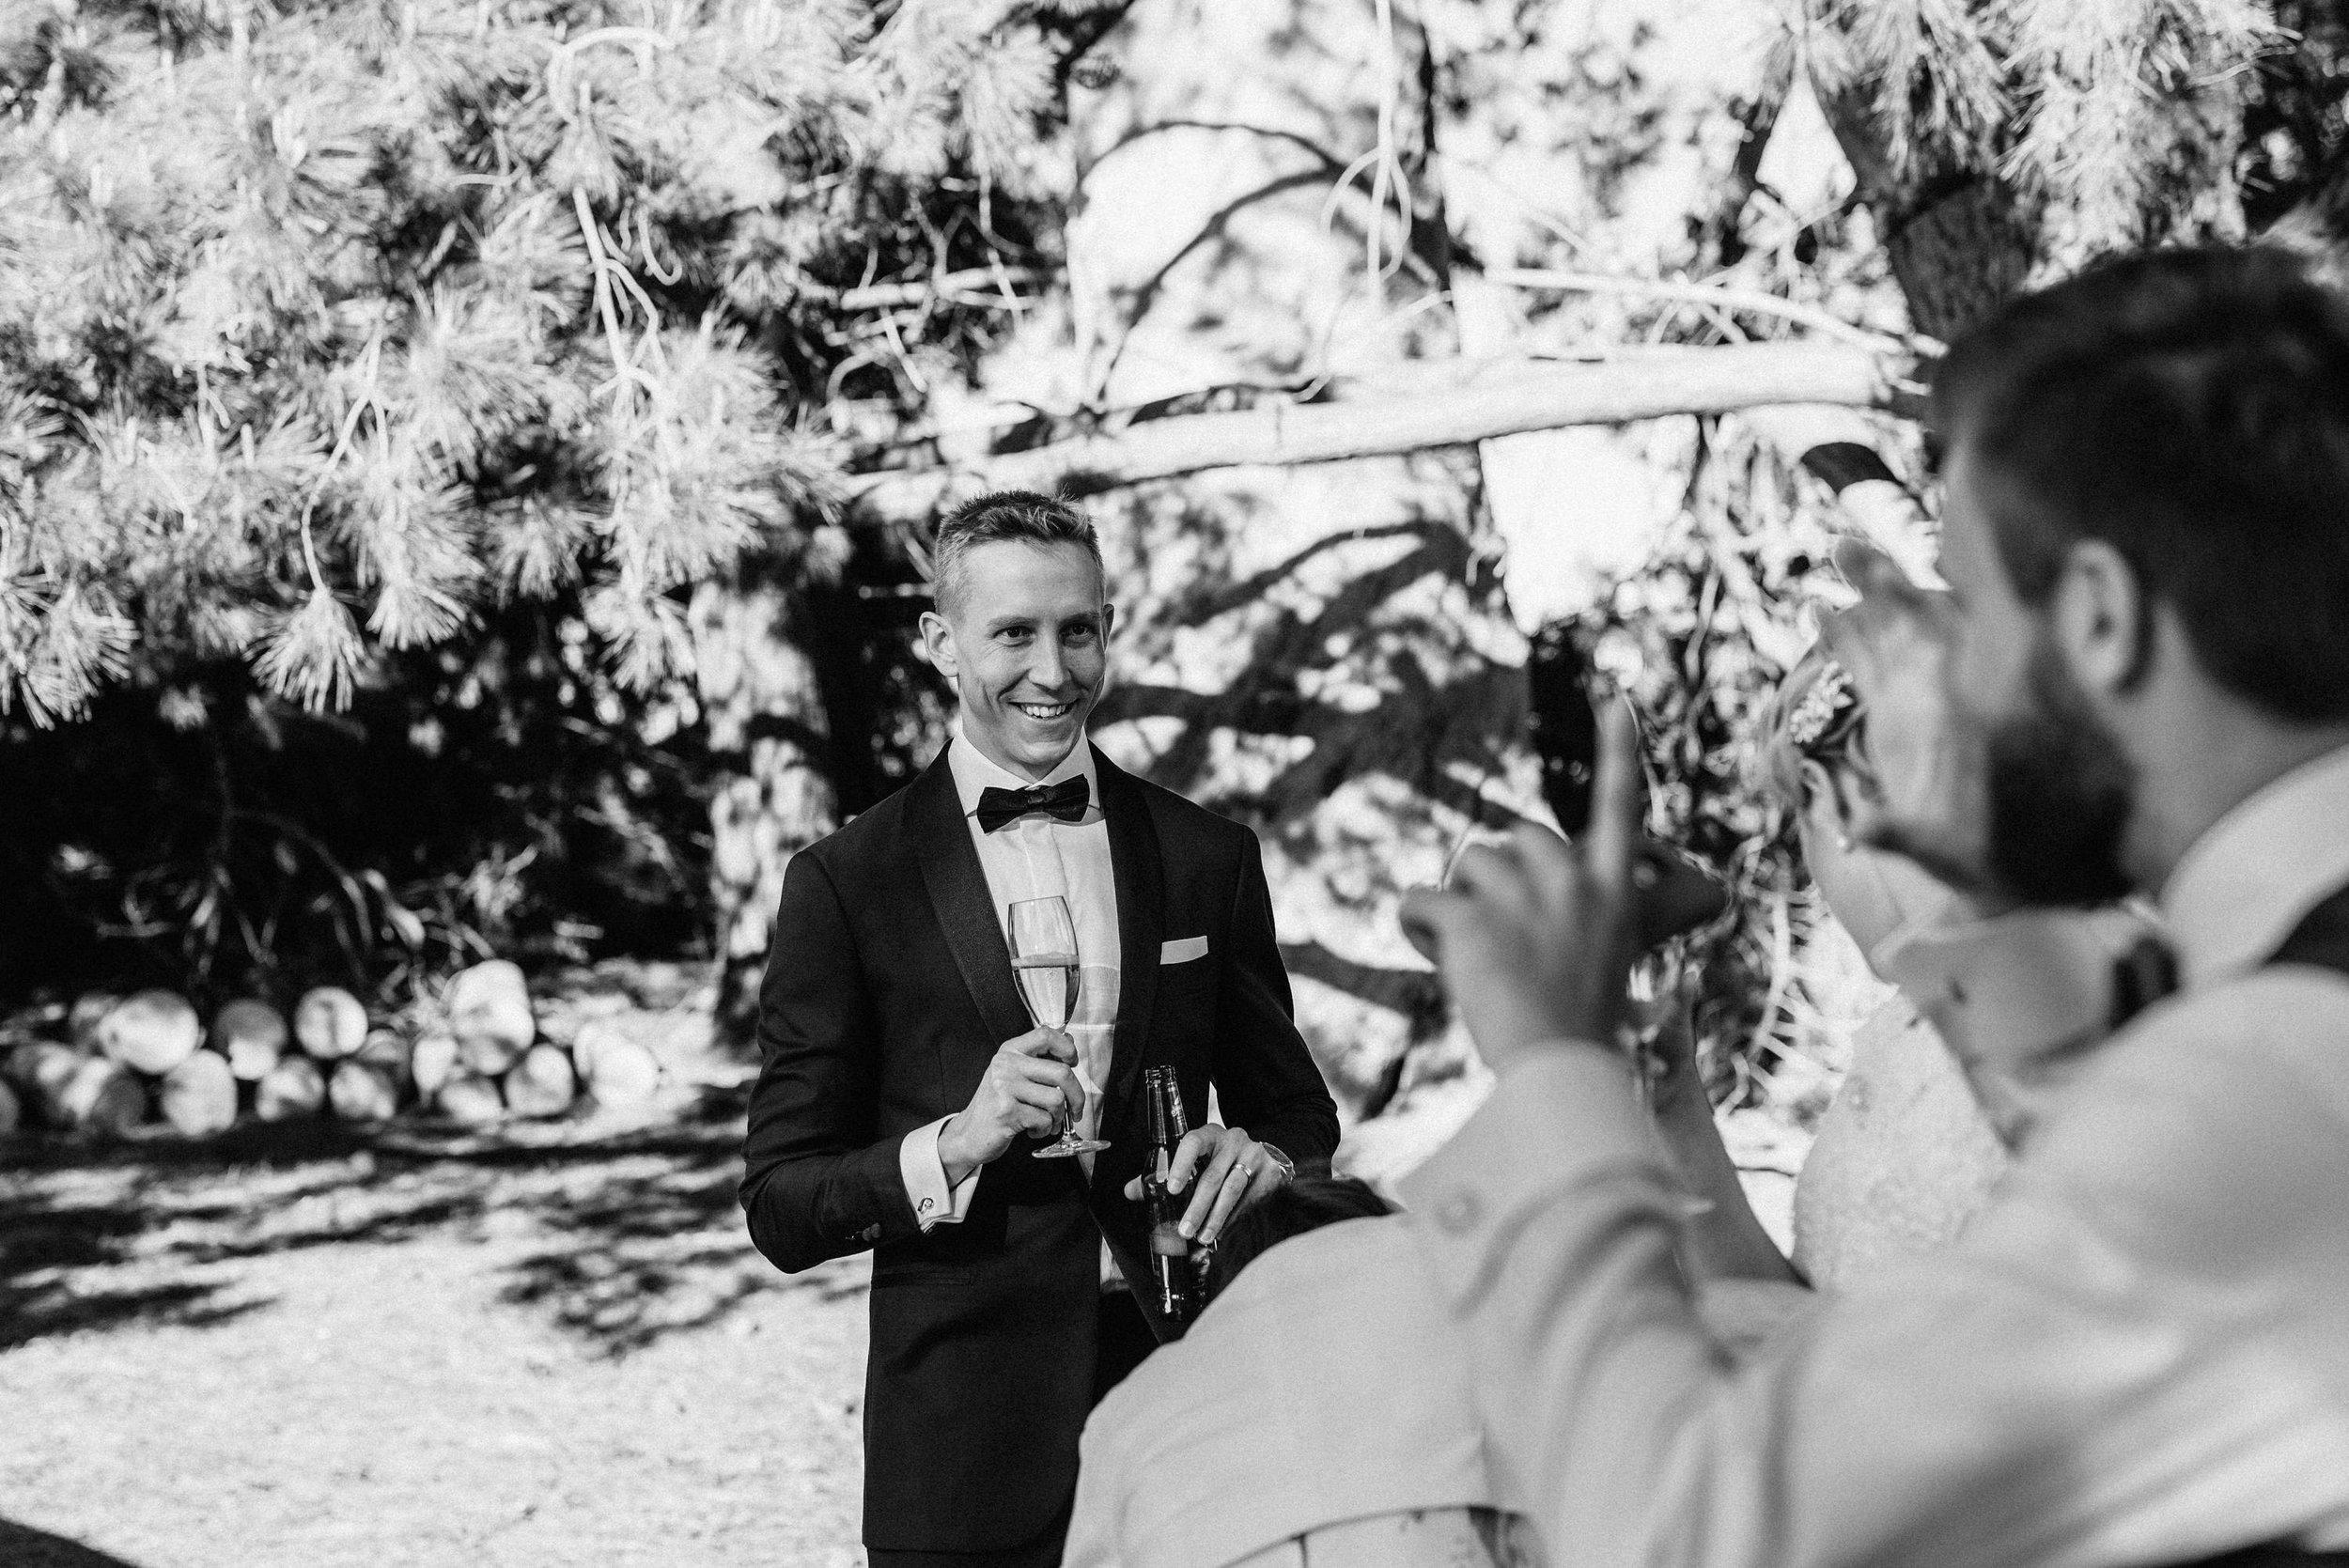 Josef-Chromy-Wedding-52.jpg